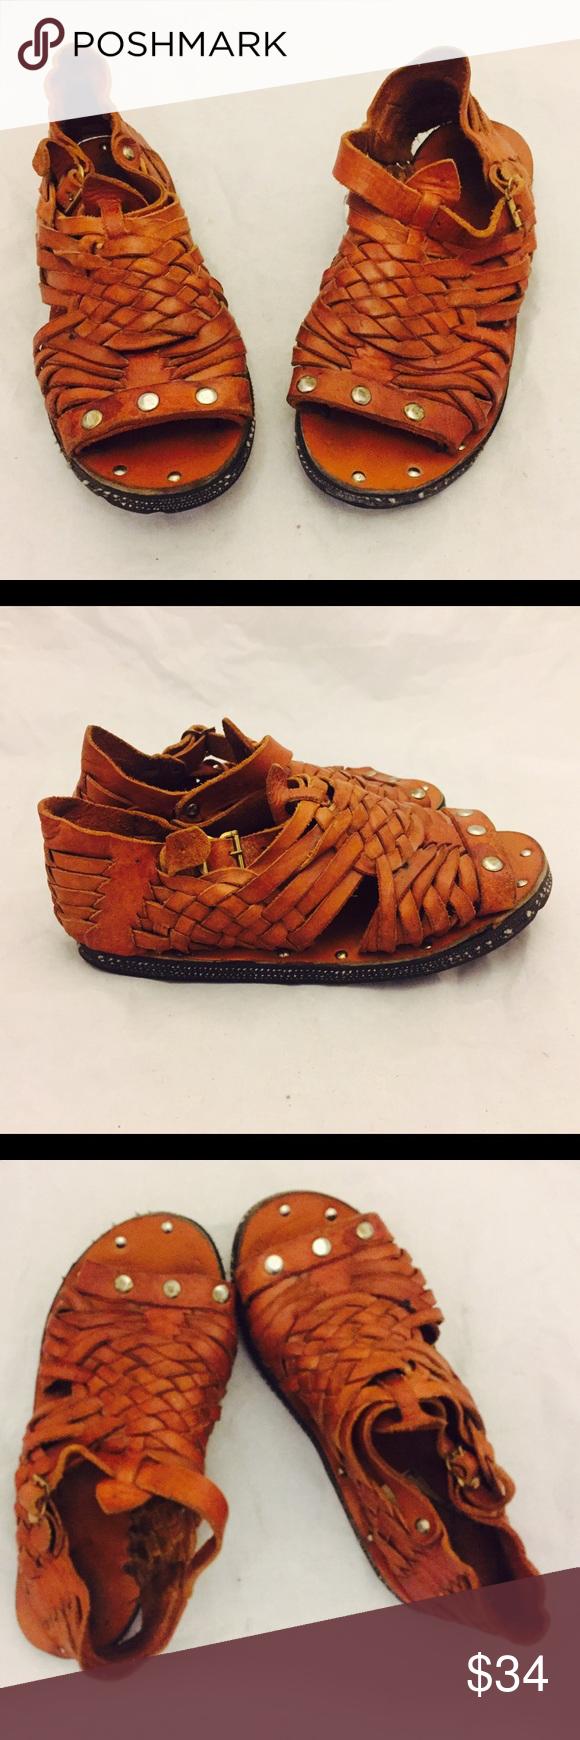 b68dbfe0c849 70s Huarache Sandals Ankle Straps Tire Soles 5 35 Adorable huarache sandals  with adjustable ankle straps